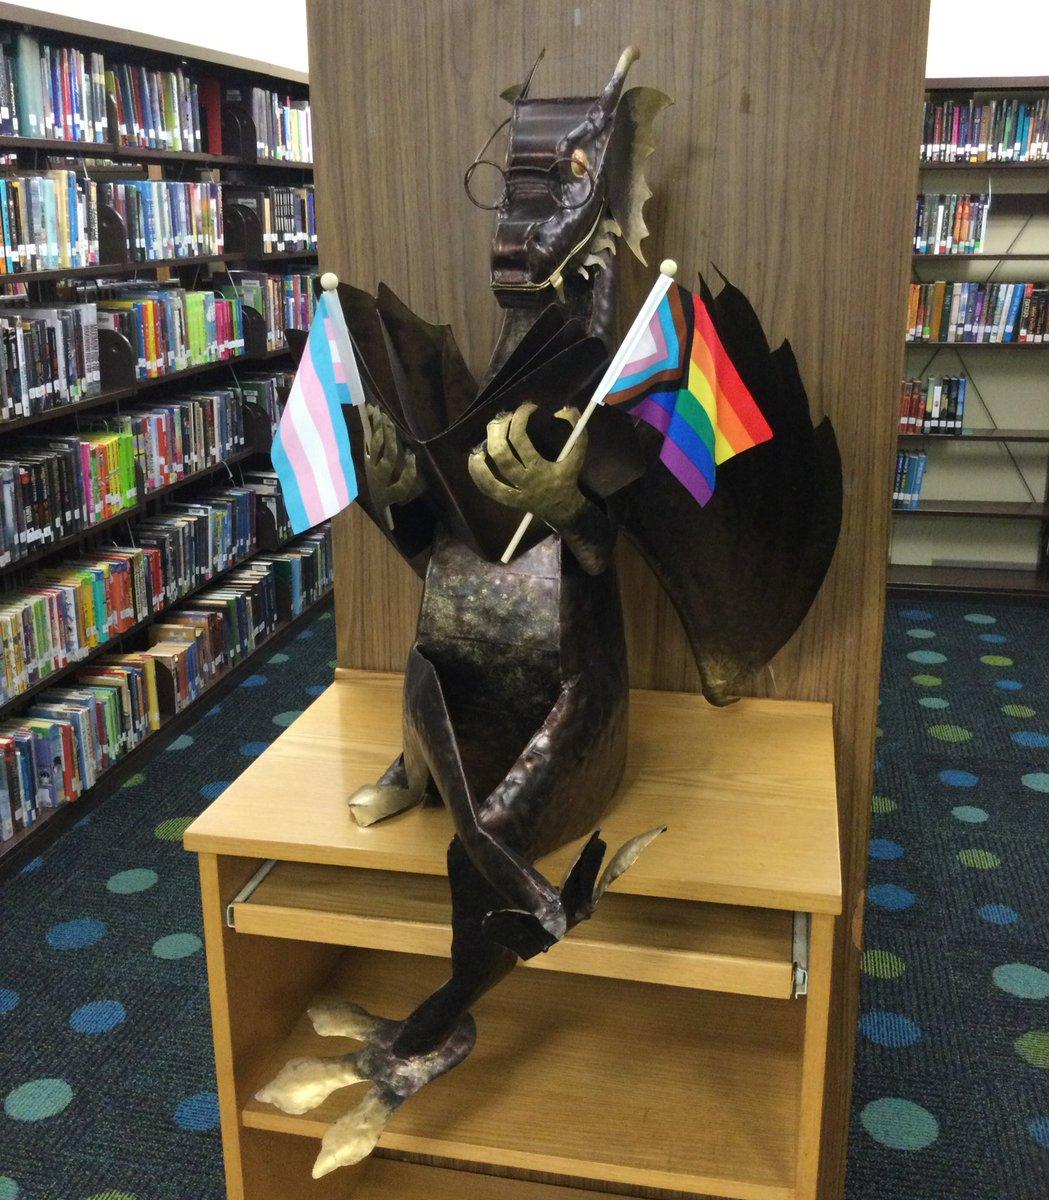 RT @JeffersonReads : Ngay cả những con rồng cũng ăn mừng Niềm tự hào! @APSLibrarian @JeffersonIBMYP # Pride2021 https://t.co/PZ2021OlxKNSV